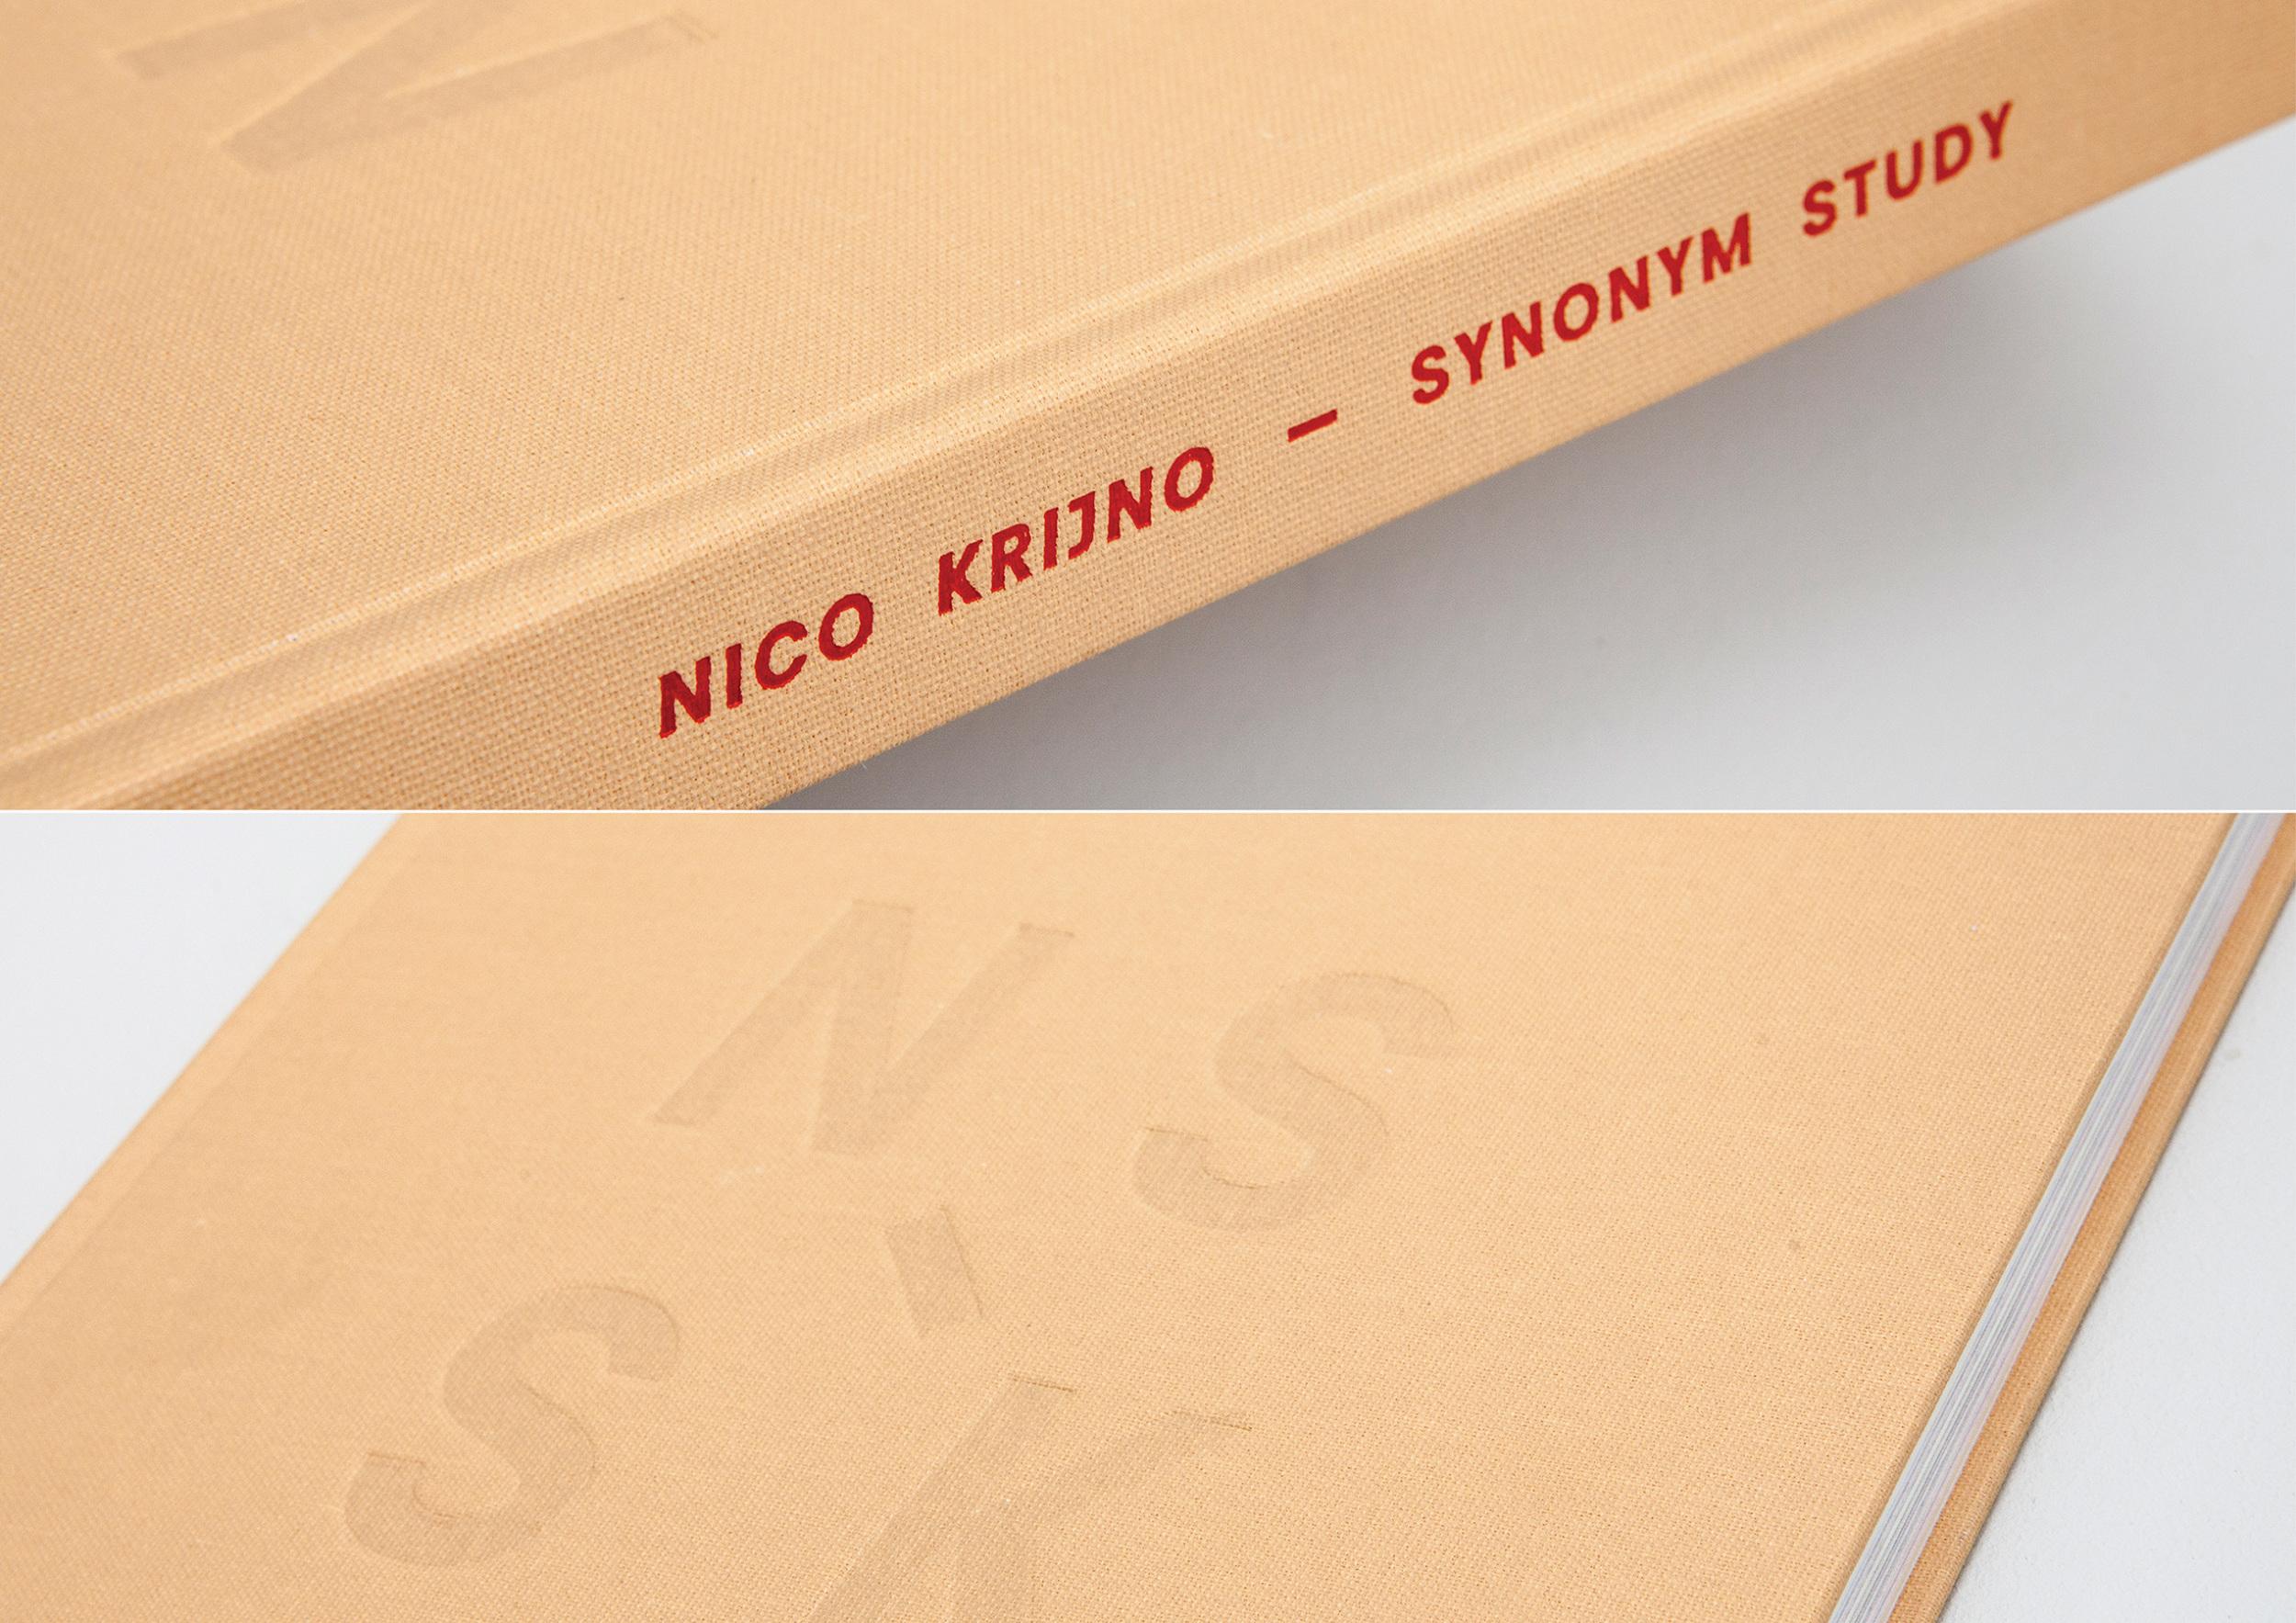 Exhibition Stand Synonym : Nico krijno synonym study book ben johnson